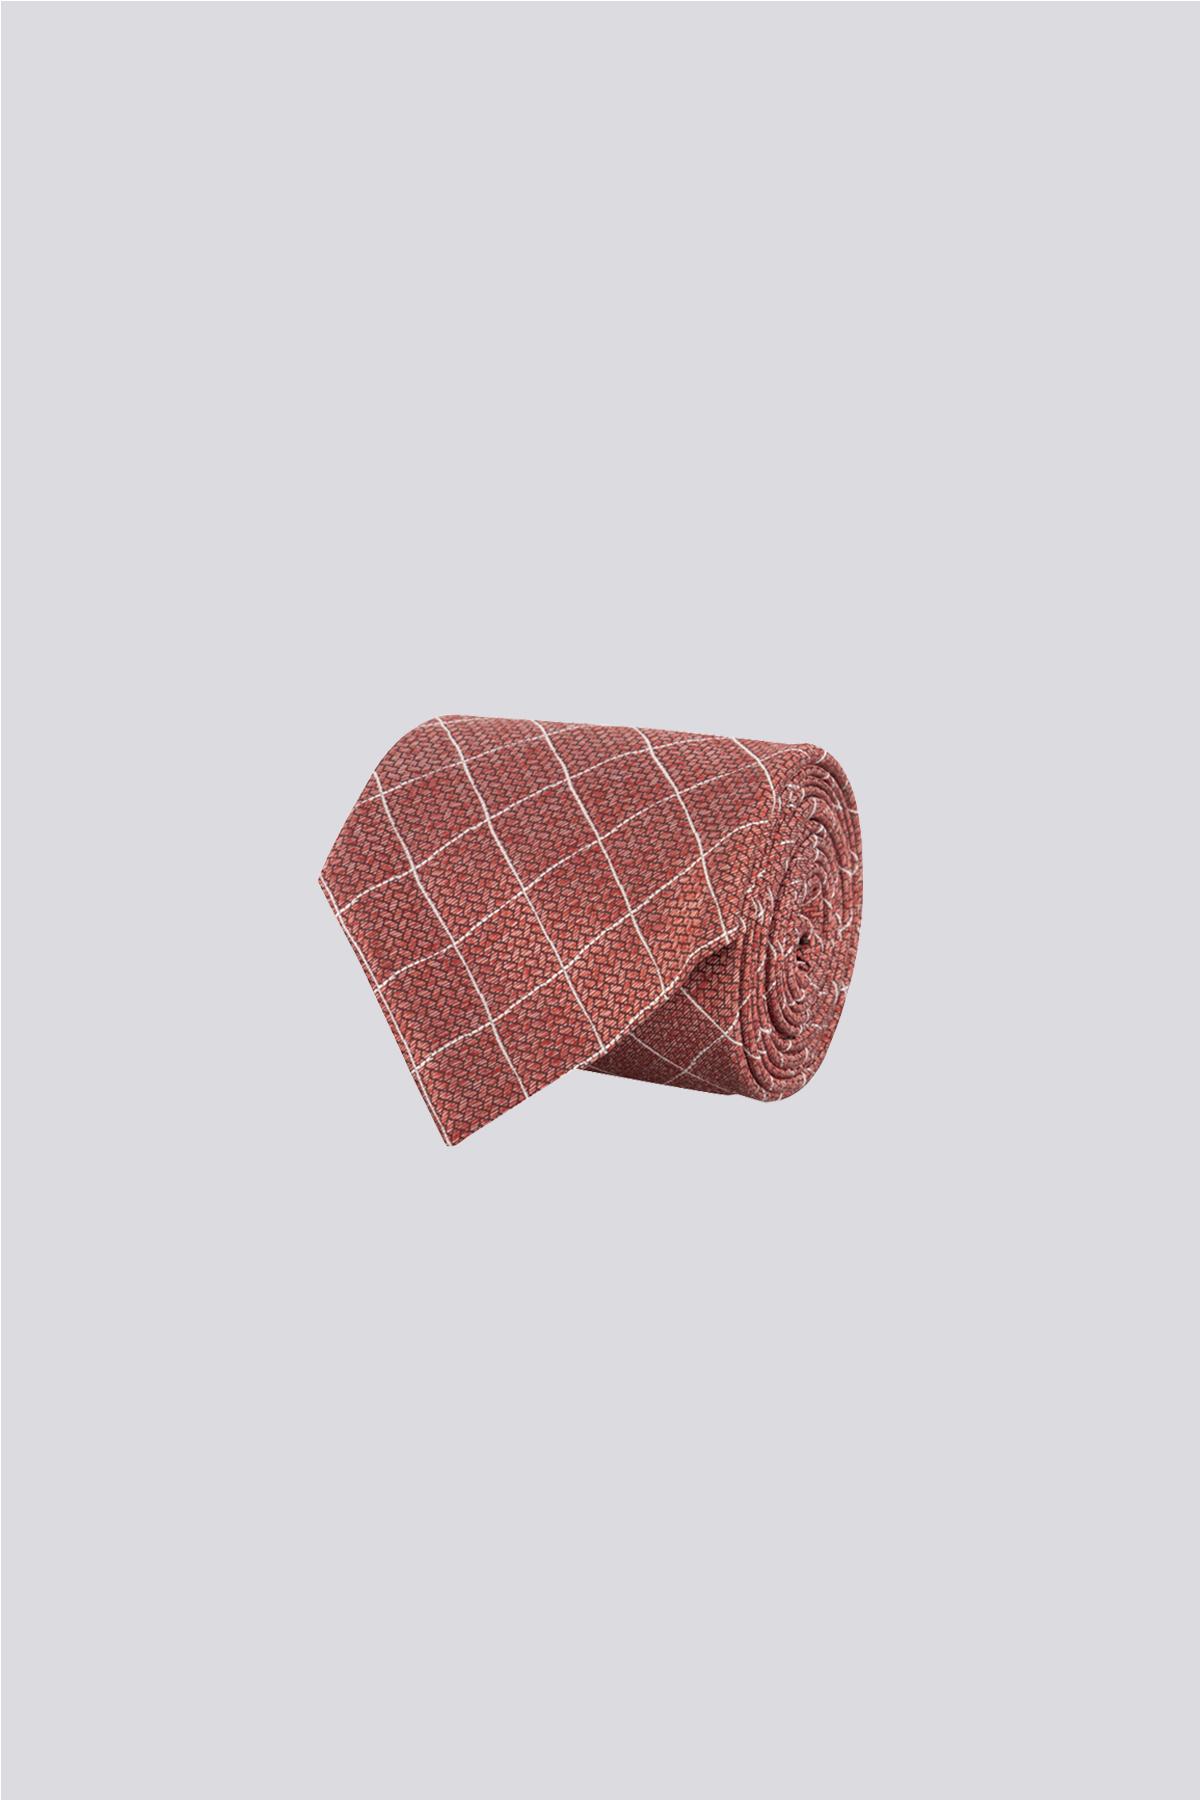 Corbata de seda marca CANALI rojo obscuro con rombos